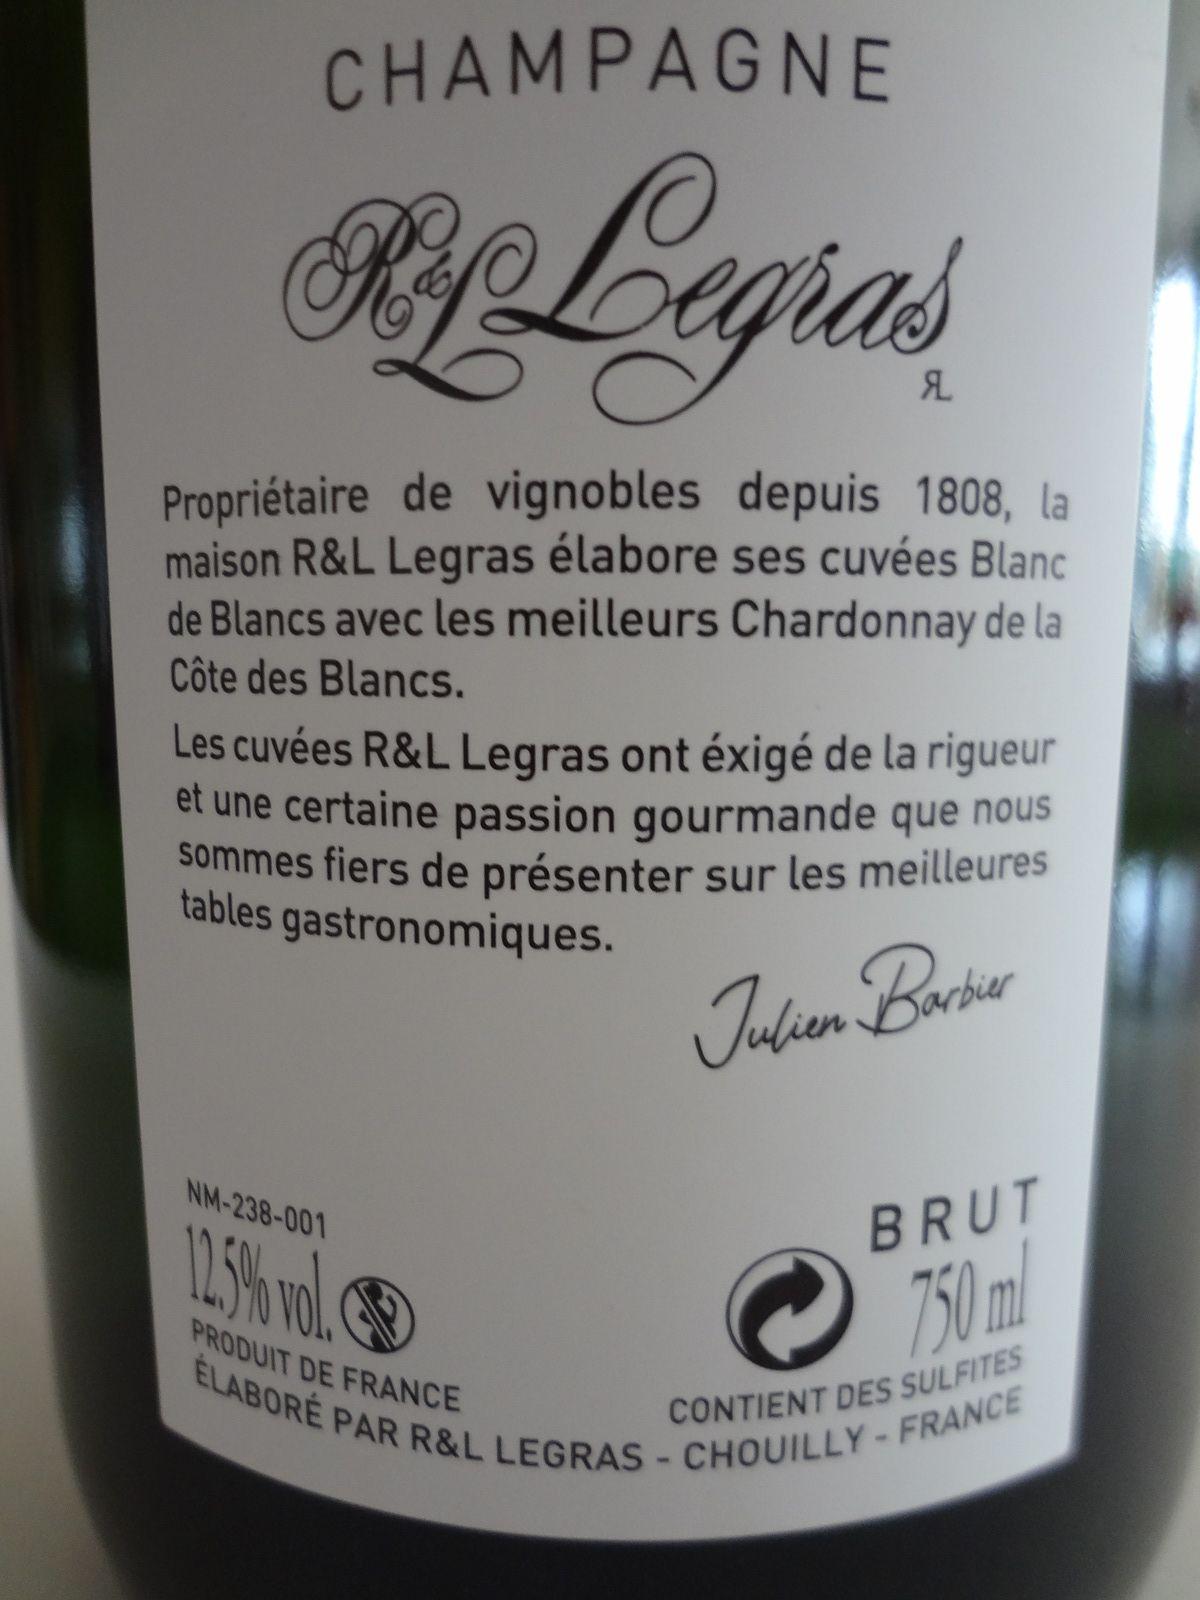 VINO PASSION Dégustation Champagne blanc de blancs.